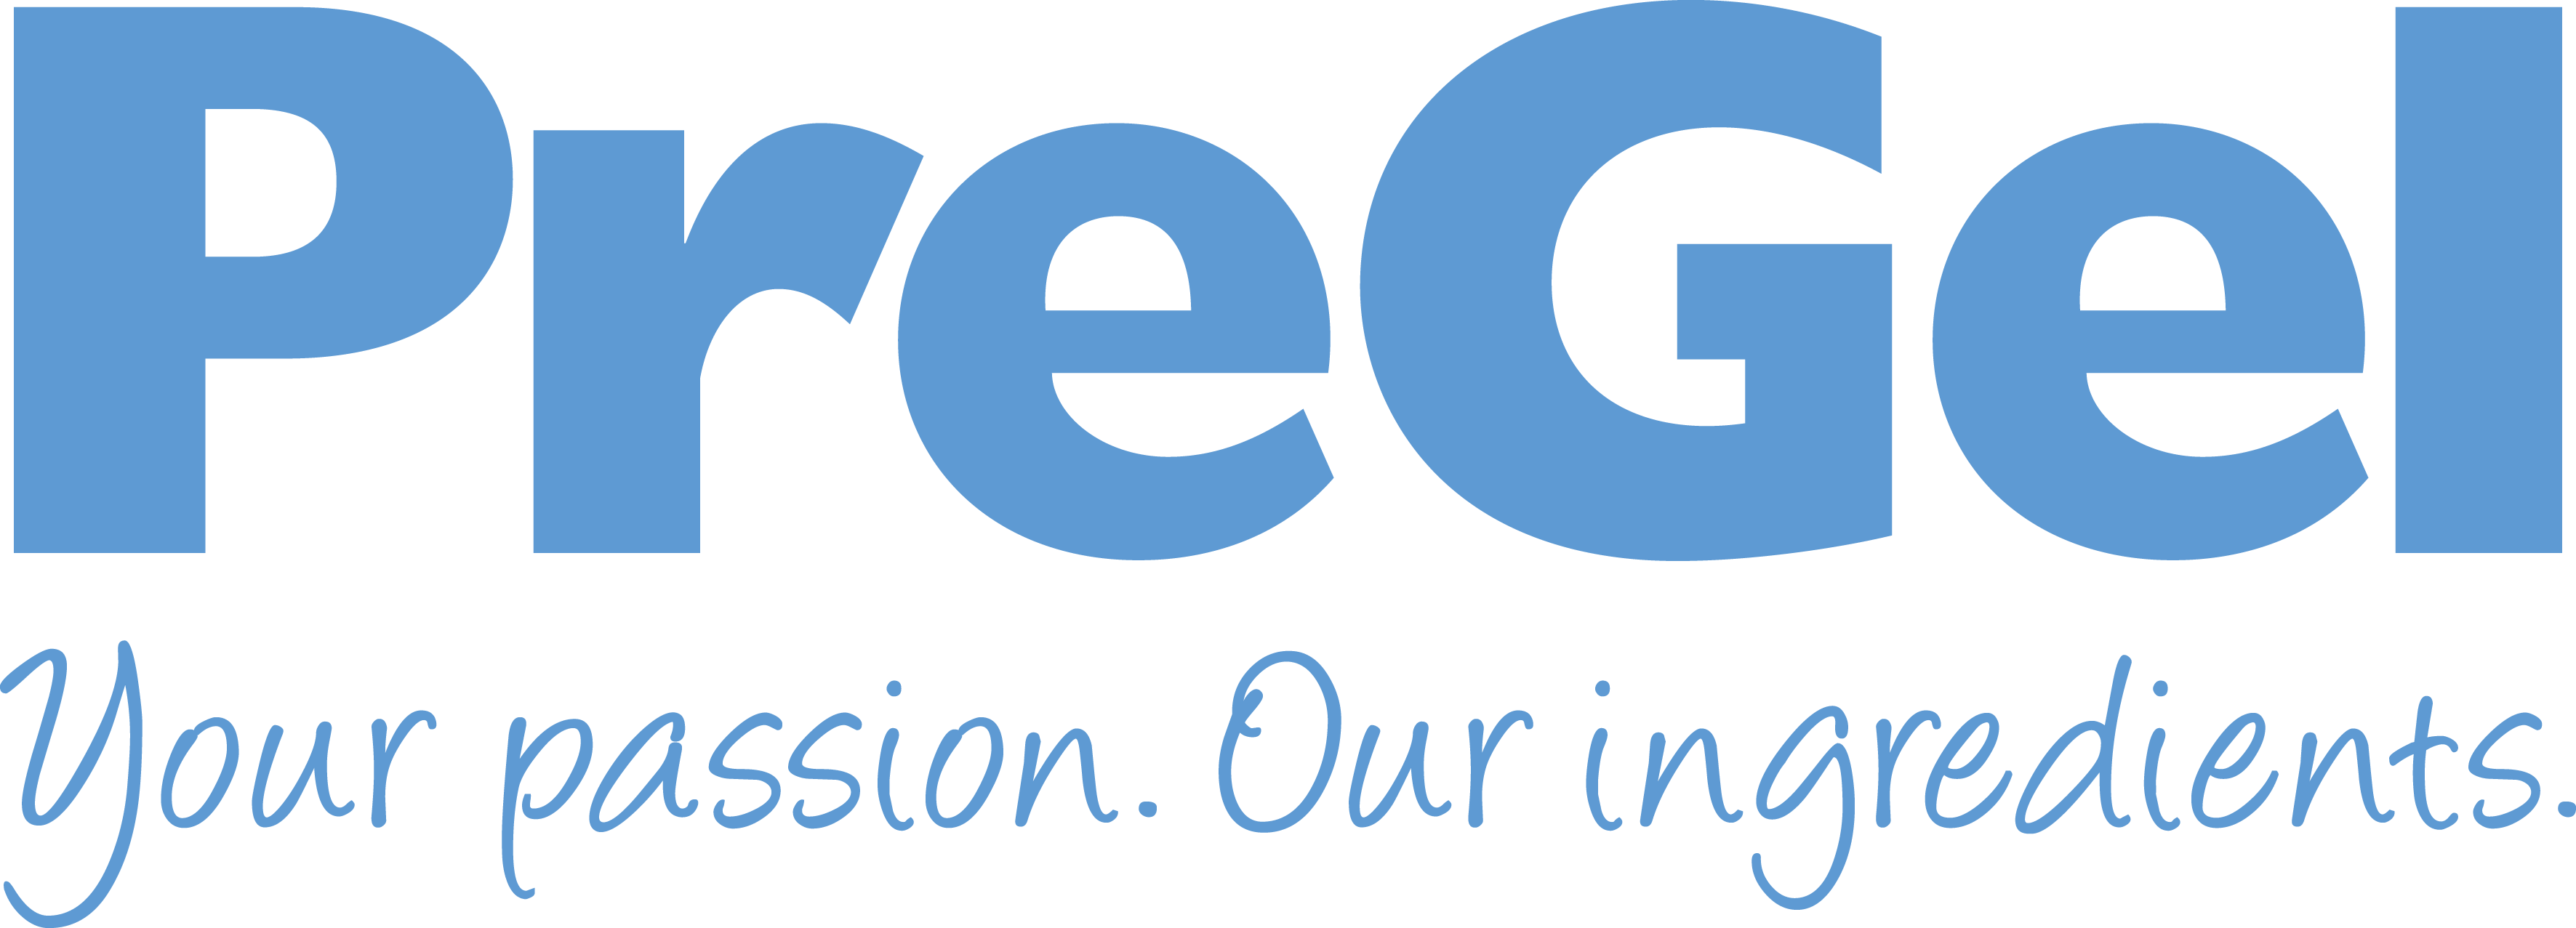 0_Logo_Pregel.png